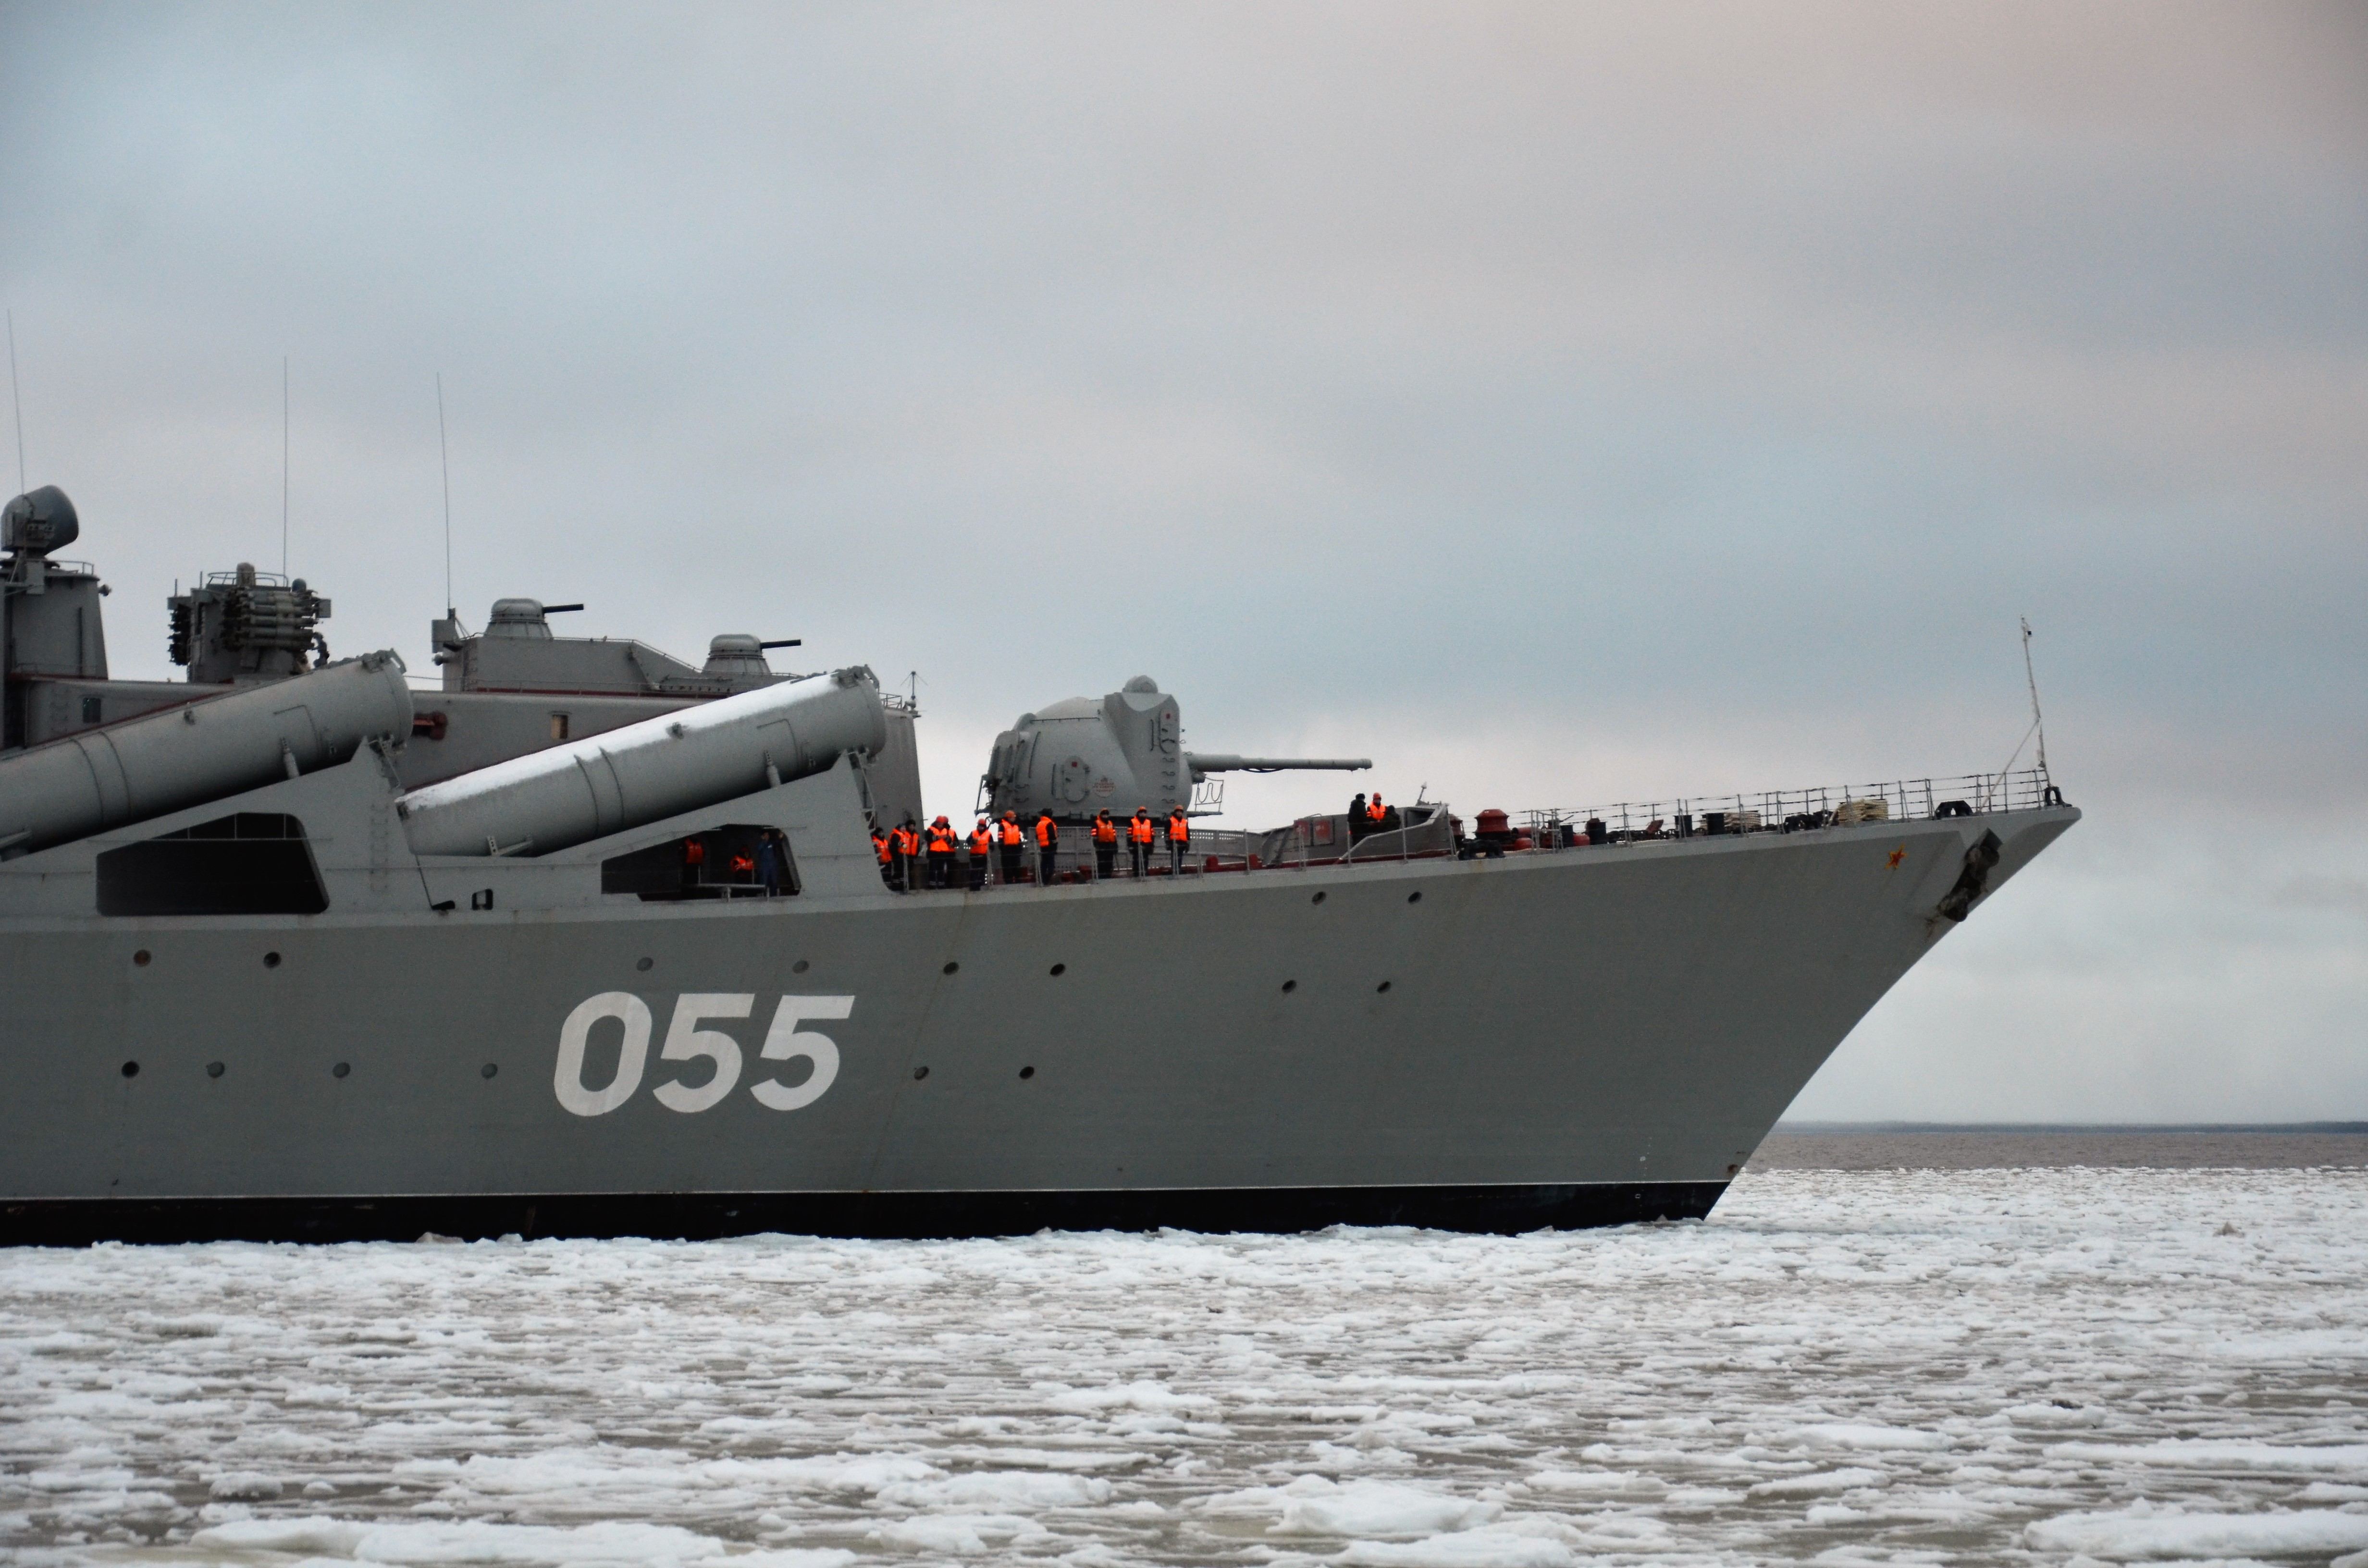 Project 1164 Atlant: Slava Class cruiser - Page 7 30-4454297-dsc-9698-2-